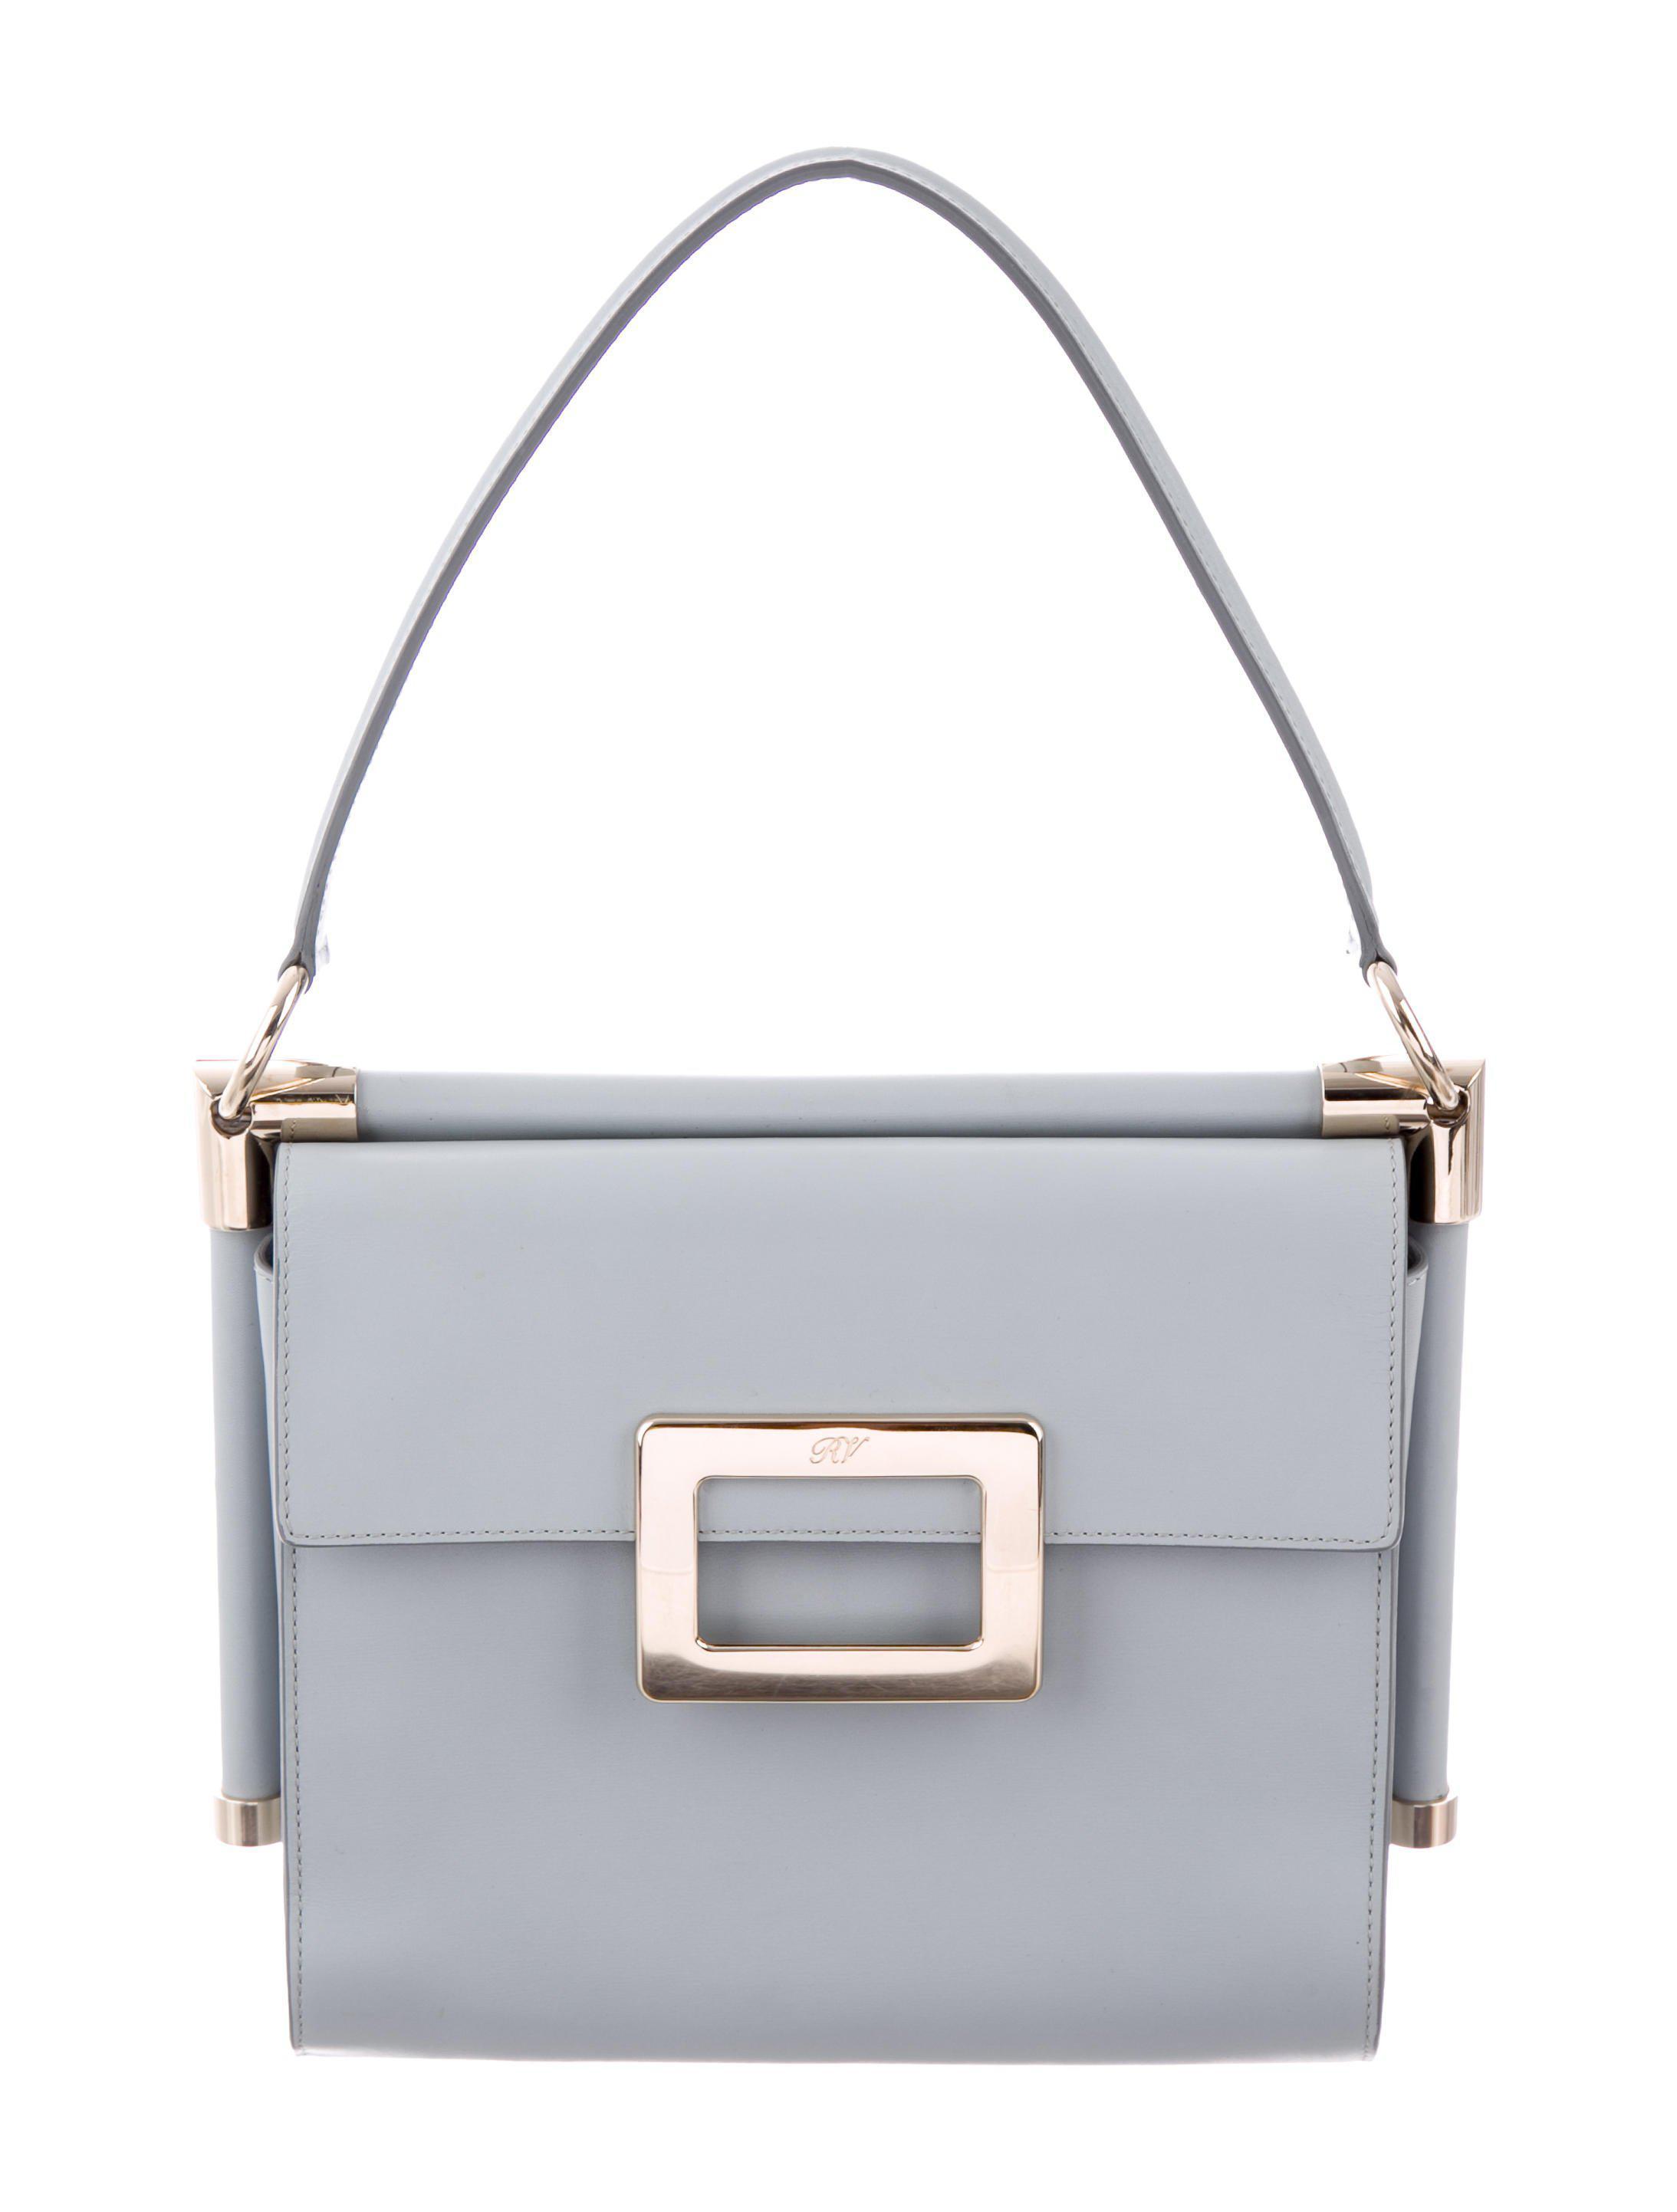 4b5193b46b ... Lyst - Roger Vivier Small Miss Viv Carré Bag Blue in Metalli best  service 2fe44 071a2 ...